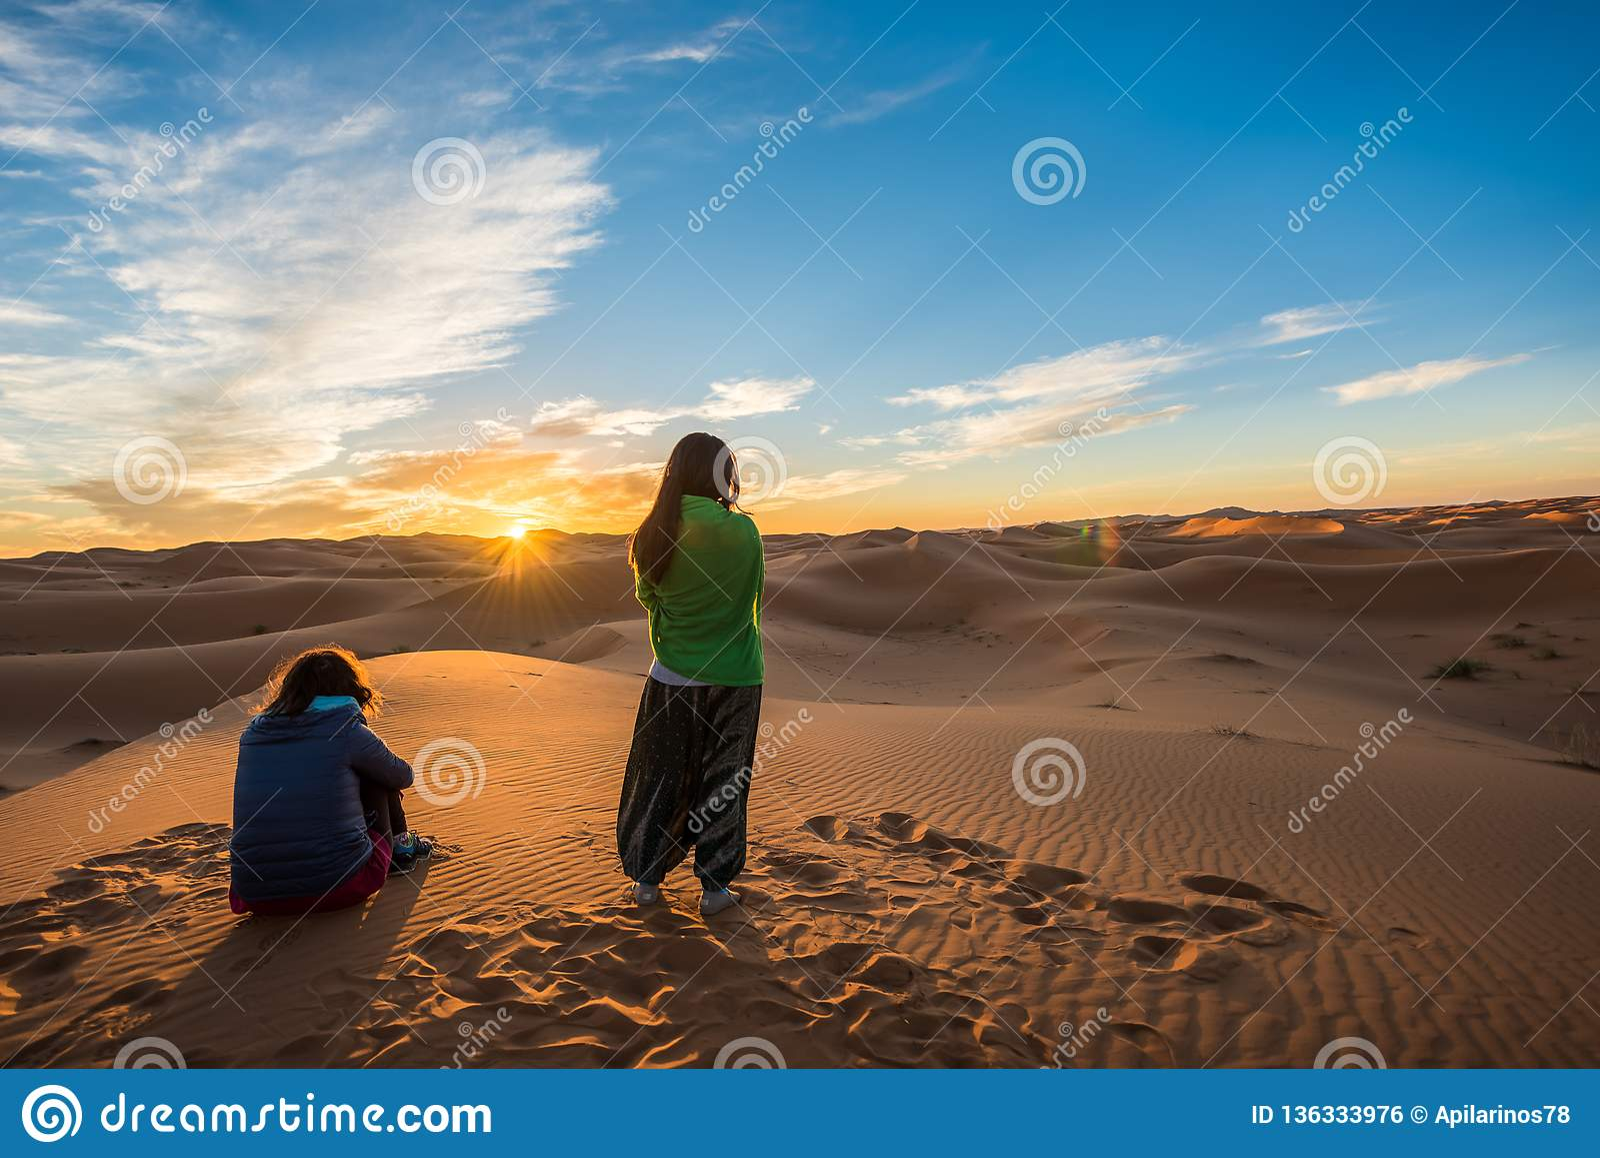 Merzouga, Morocco - October 16, 2018: Two women watching a beautiful sunrise over Erg Chebbi sand dunes near Merzouga, Morocco